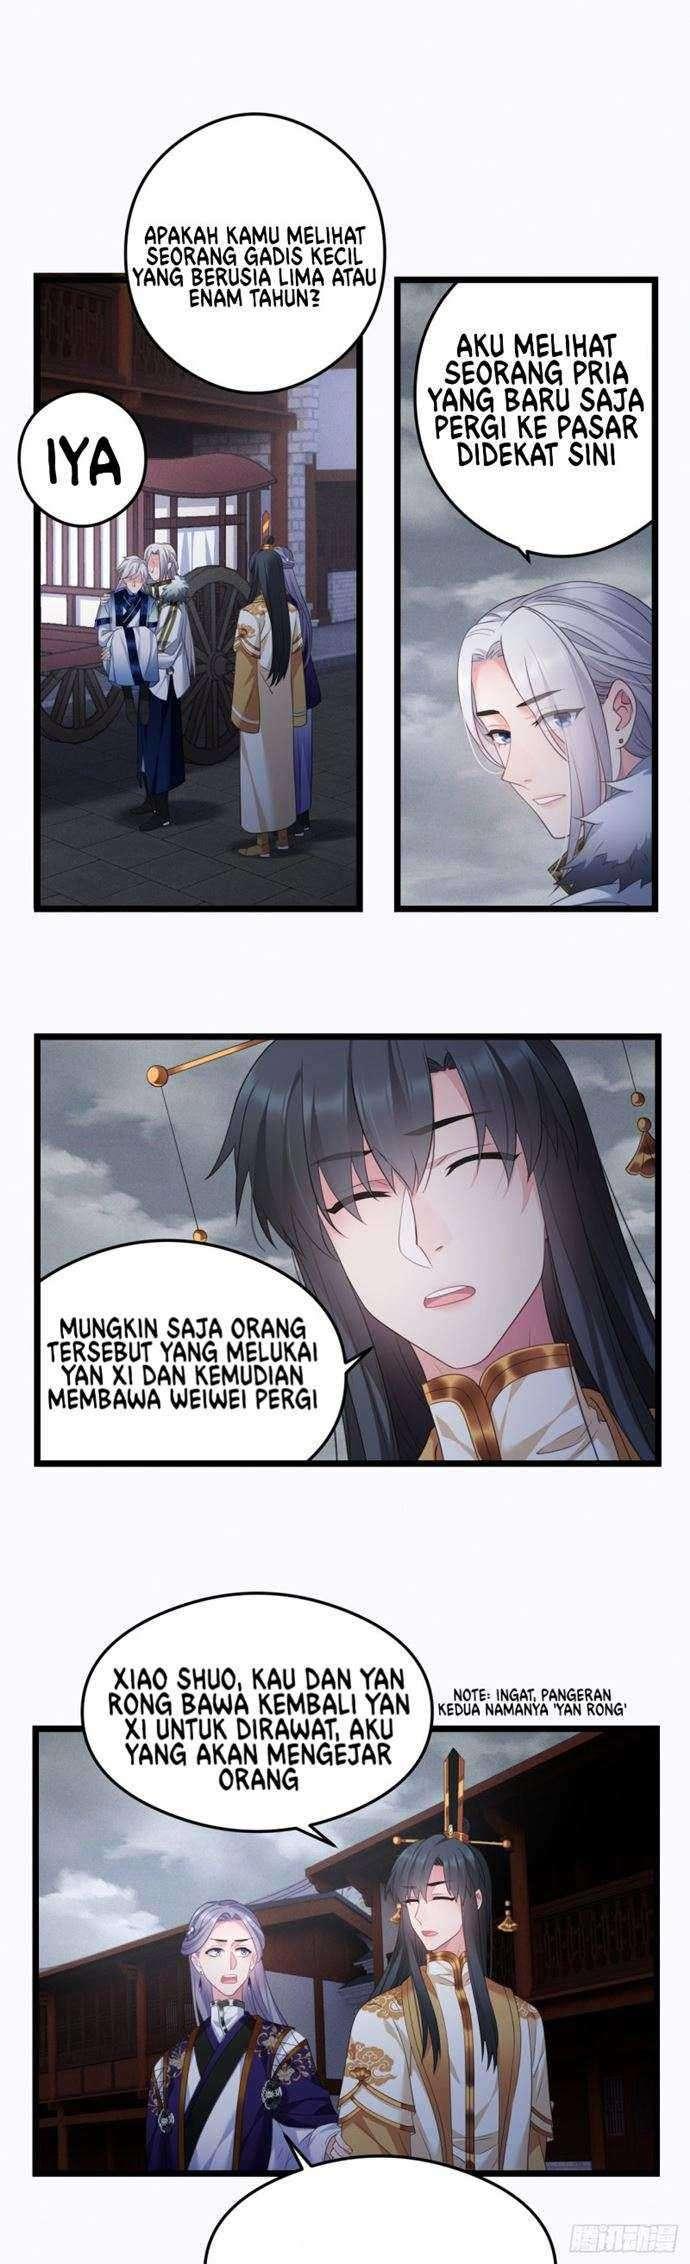 I Won't Marry The Enemy Prince Chapter 44 - Komik Terbaru